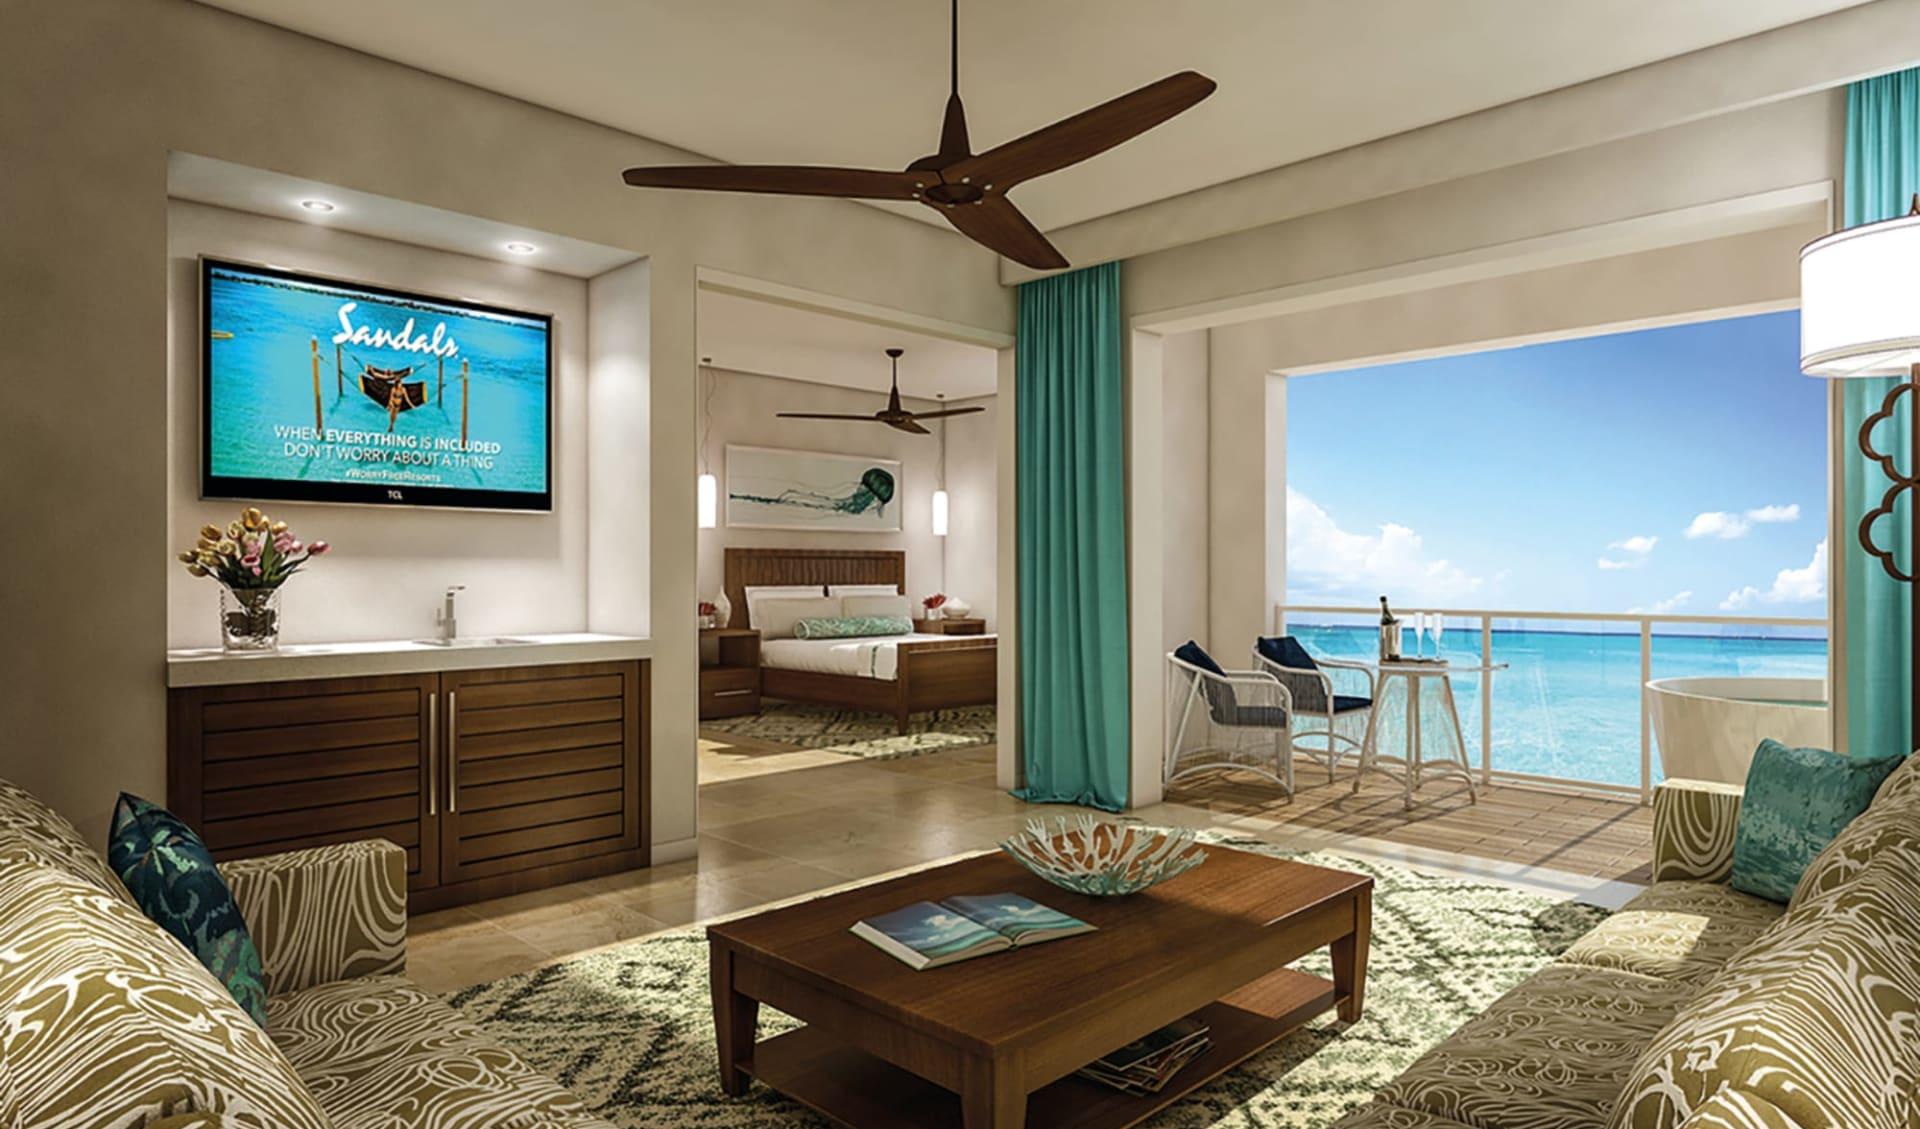 Sandals Regency La Toc Golf Resort & Spa in Castries: Zimmer Sandals La Toc St.Lucia -  Oceanview Zimmer cSandals